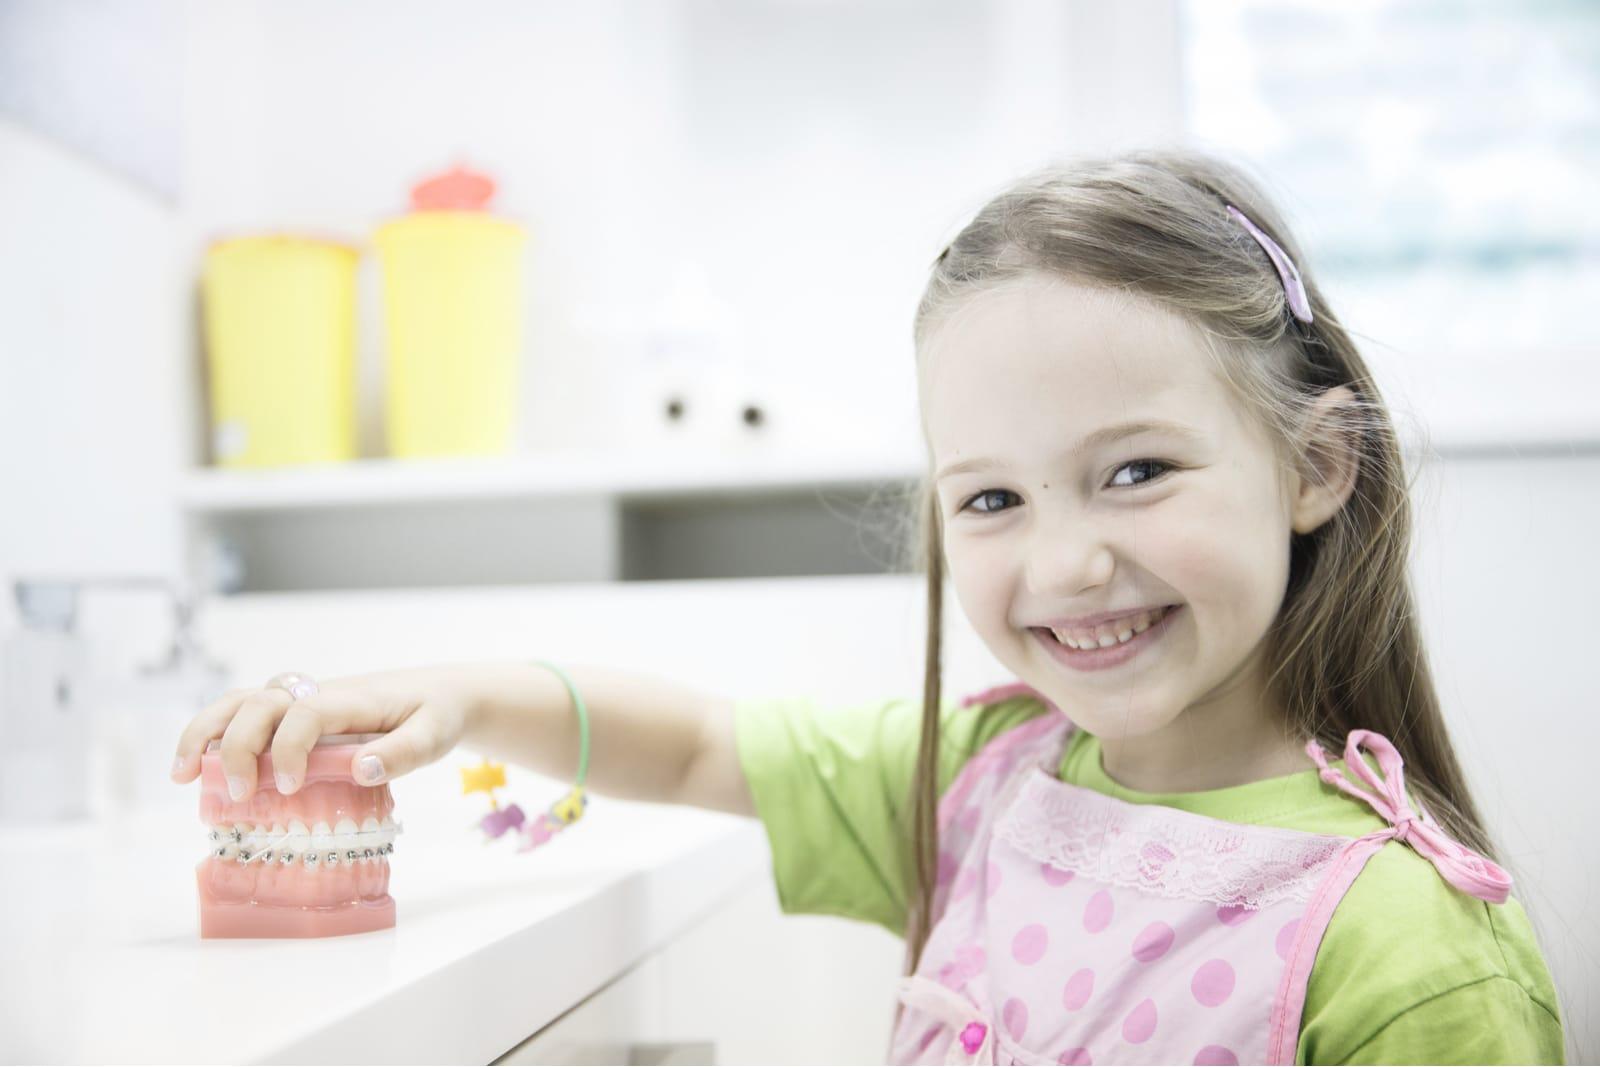 Orthodontist for kids in Redmond, WA